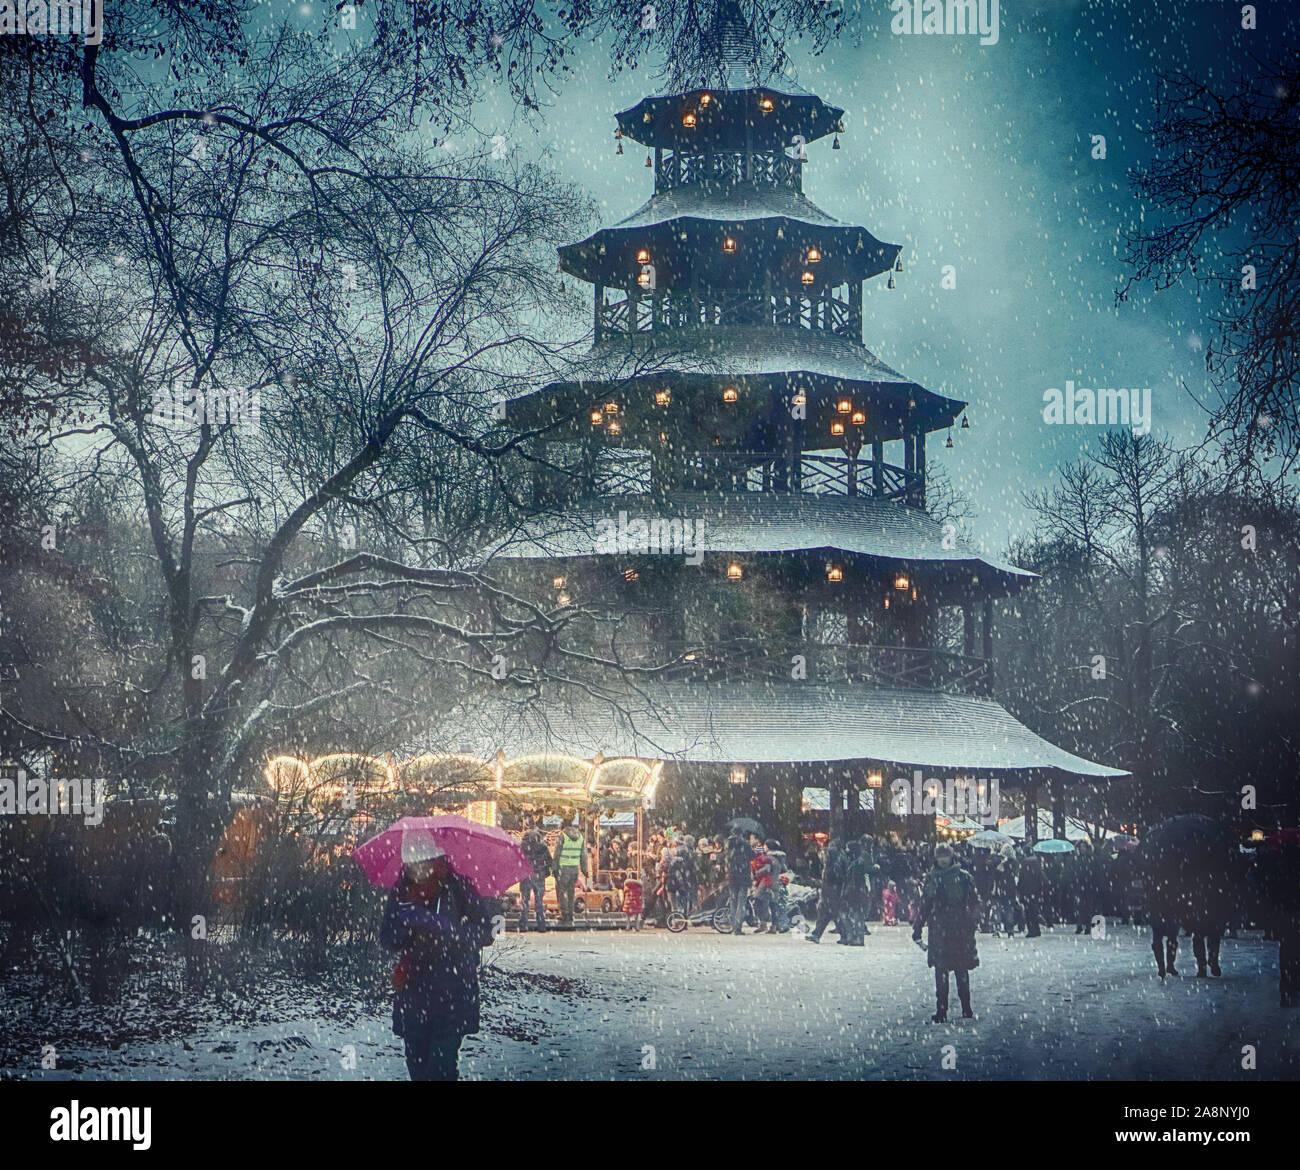 Monaco di Baviera, Germania - Mercatino di Natale a Torre cinese in Englischer Garten e la caduta di neve Foto Stock